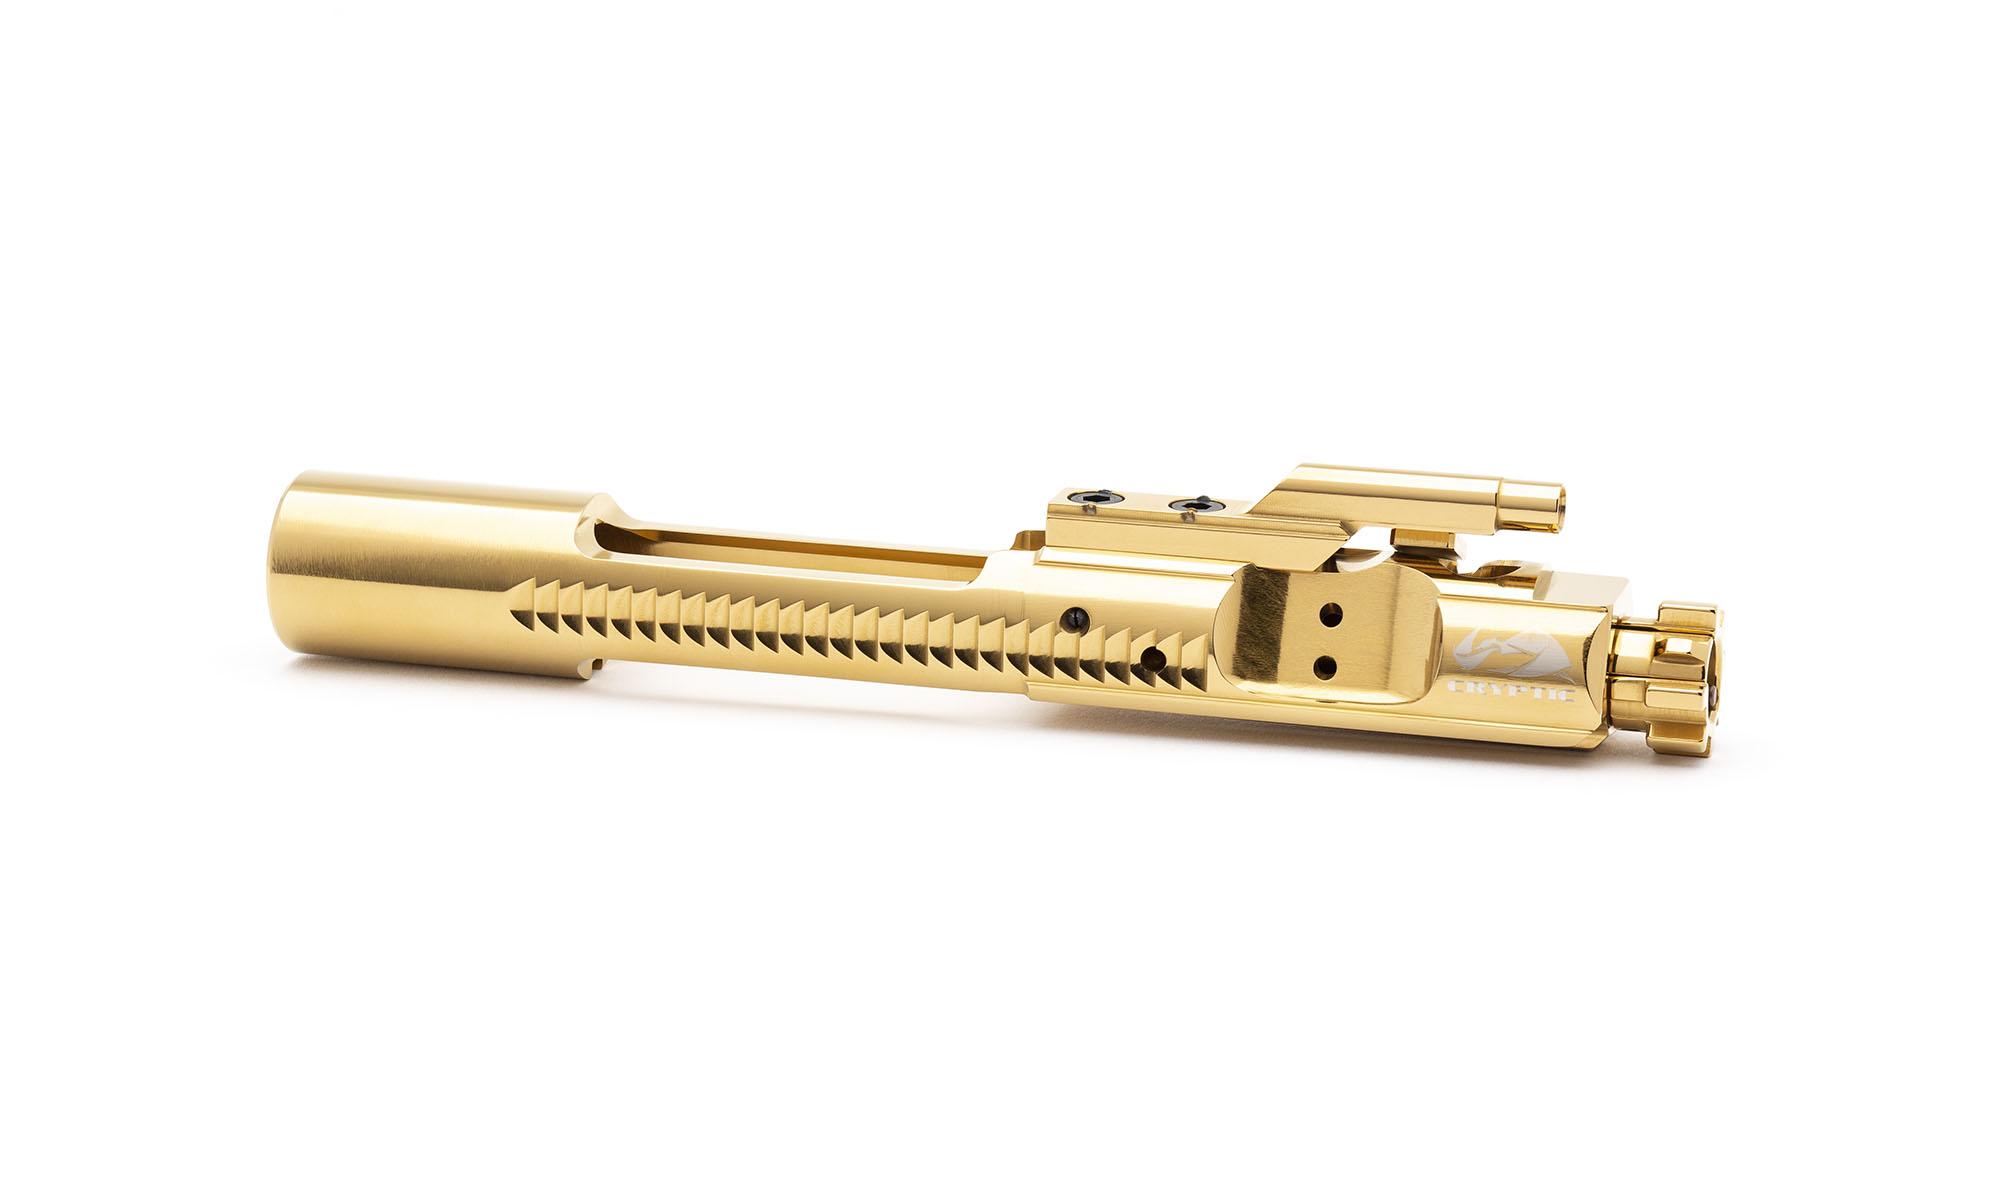 AR15 Titanium Bolt Carrier Group - Mystic Gold